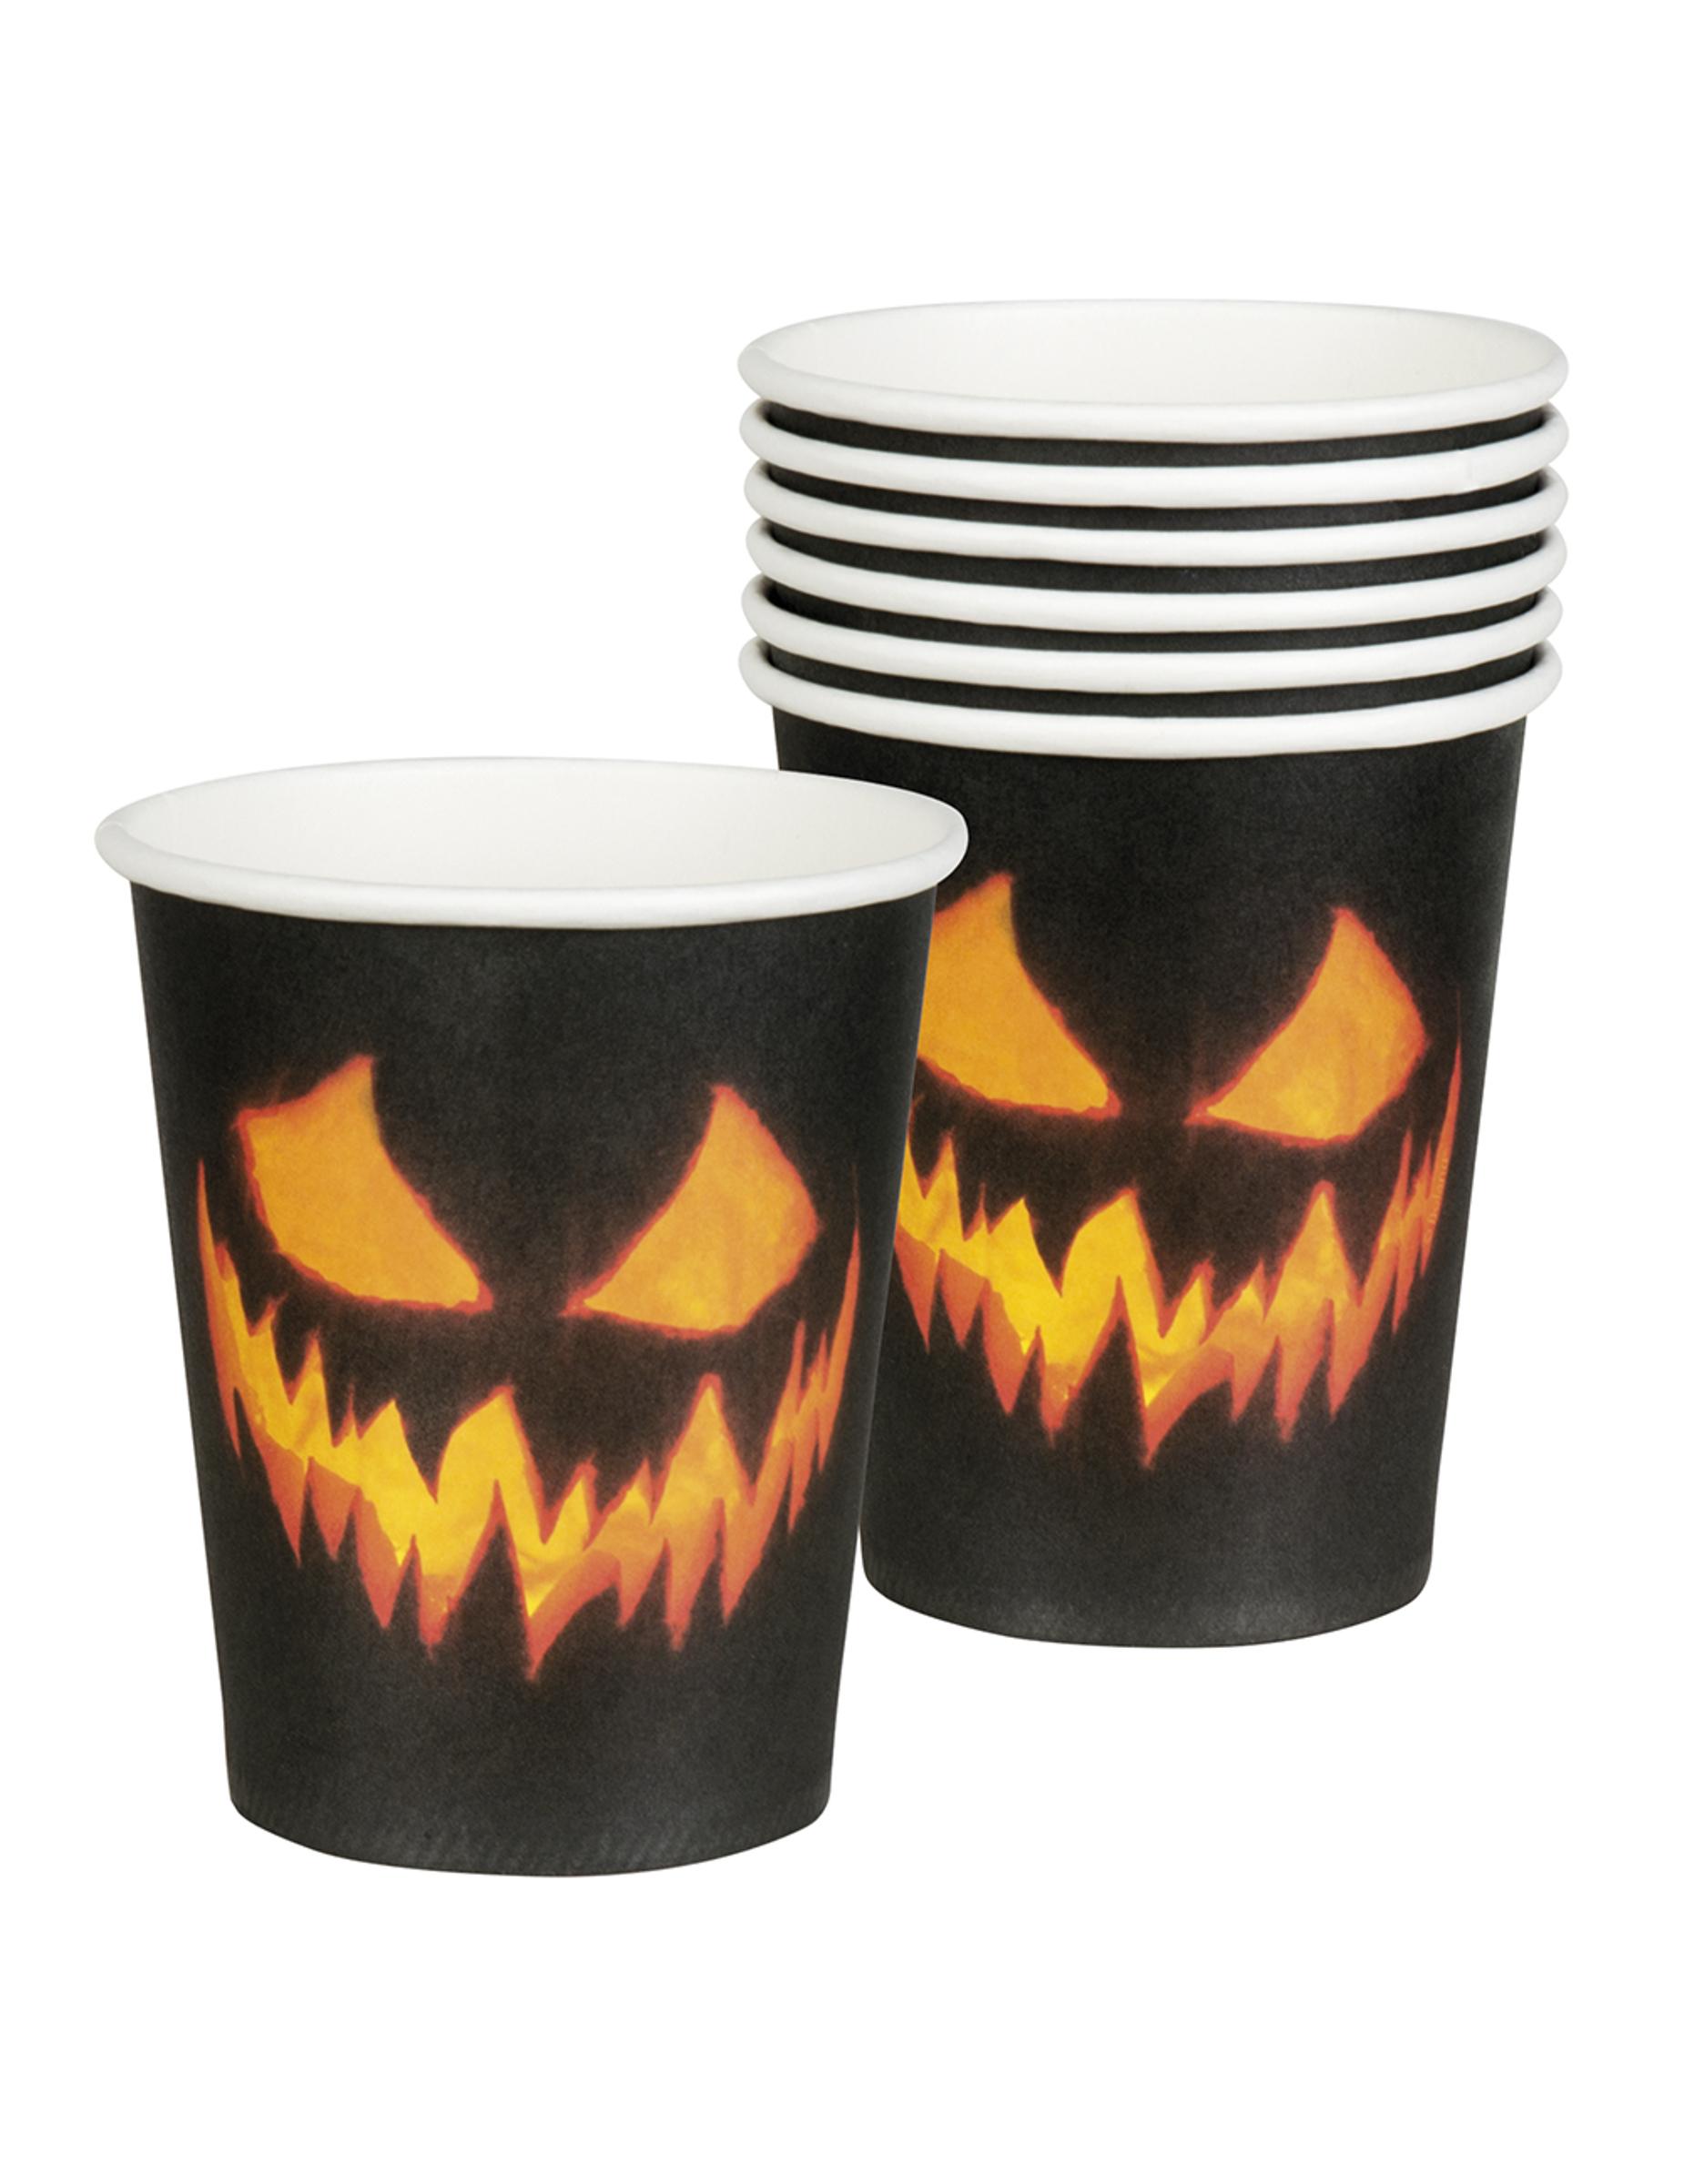 K rbis pappbecher halloween tischdekoration 6 st ck - Tischdekoration halloween ...